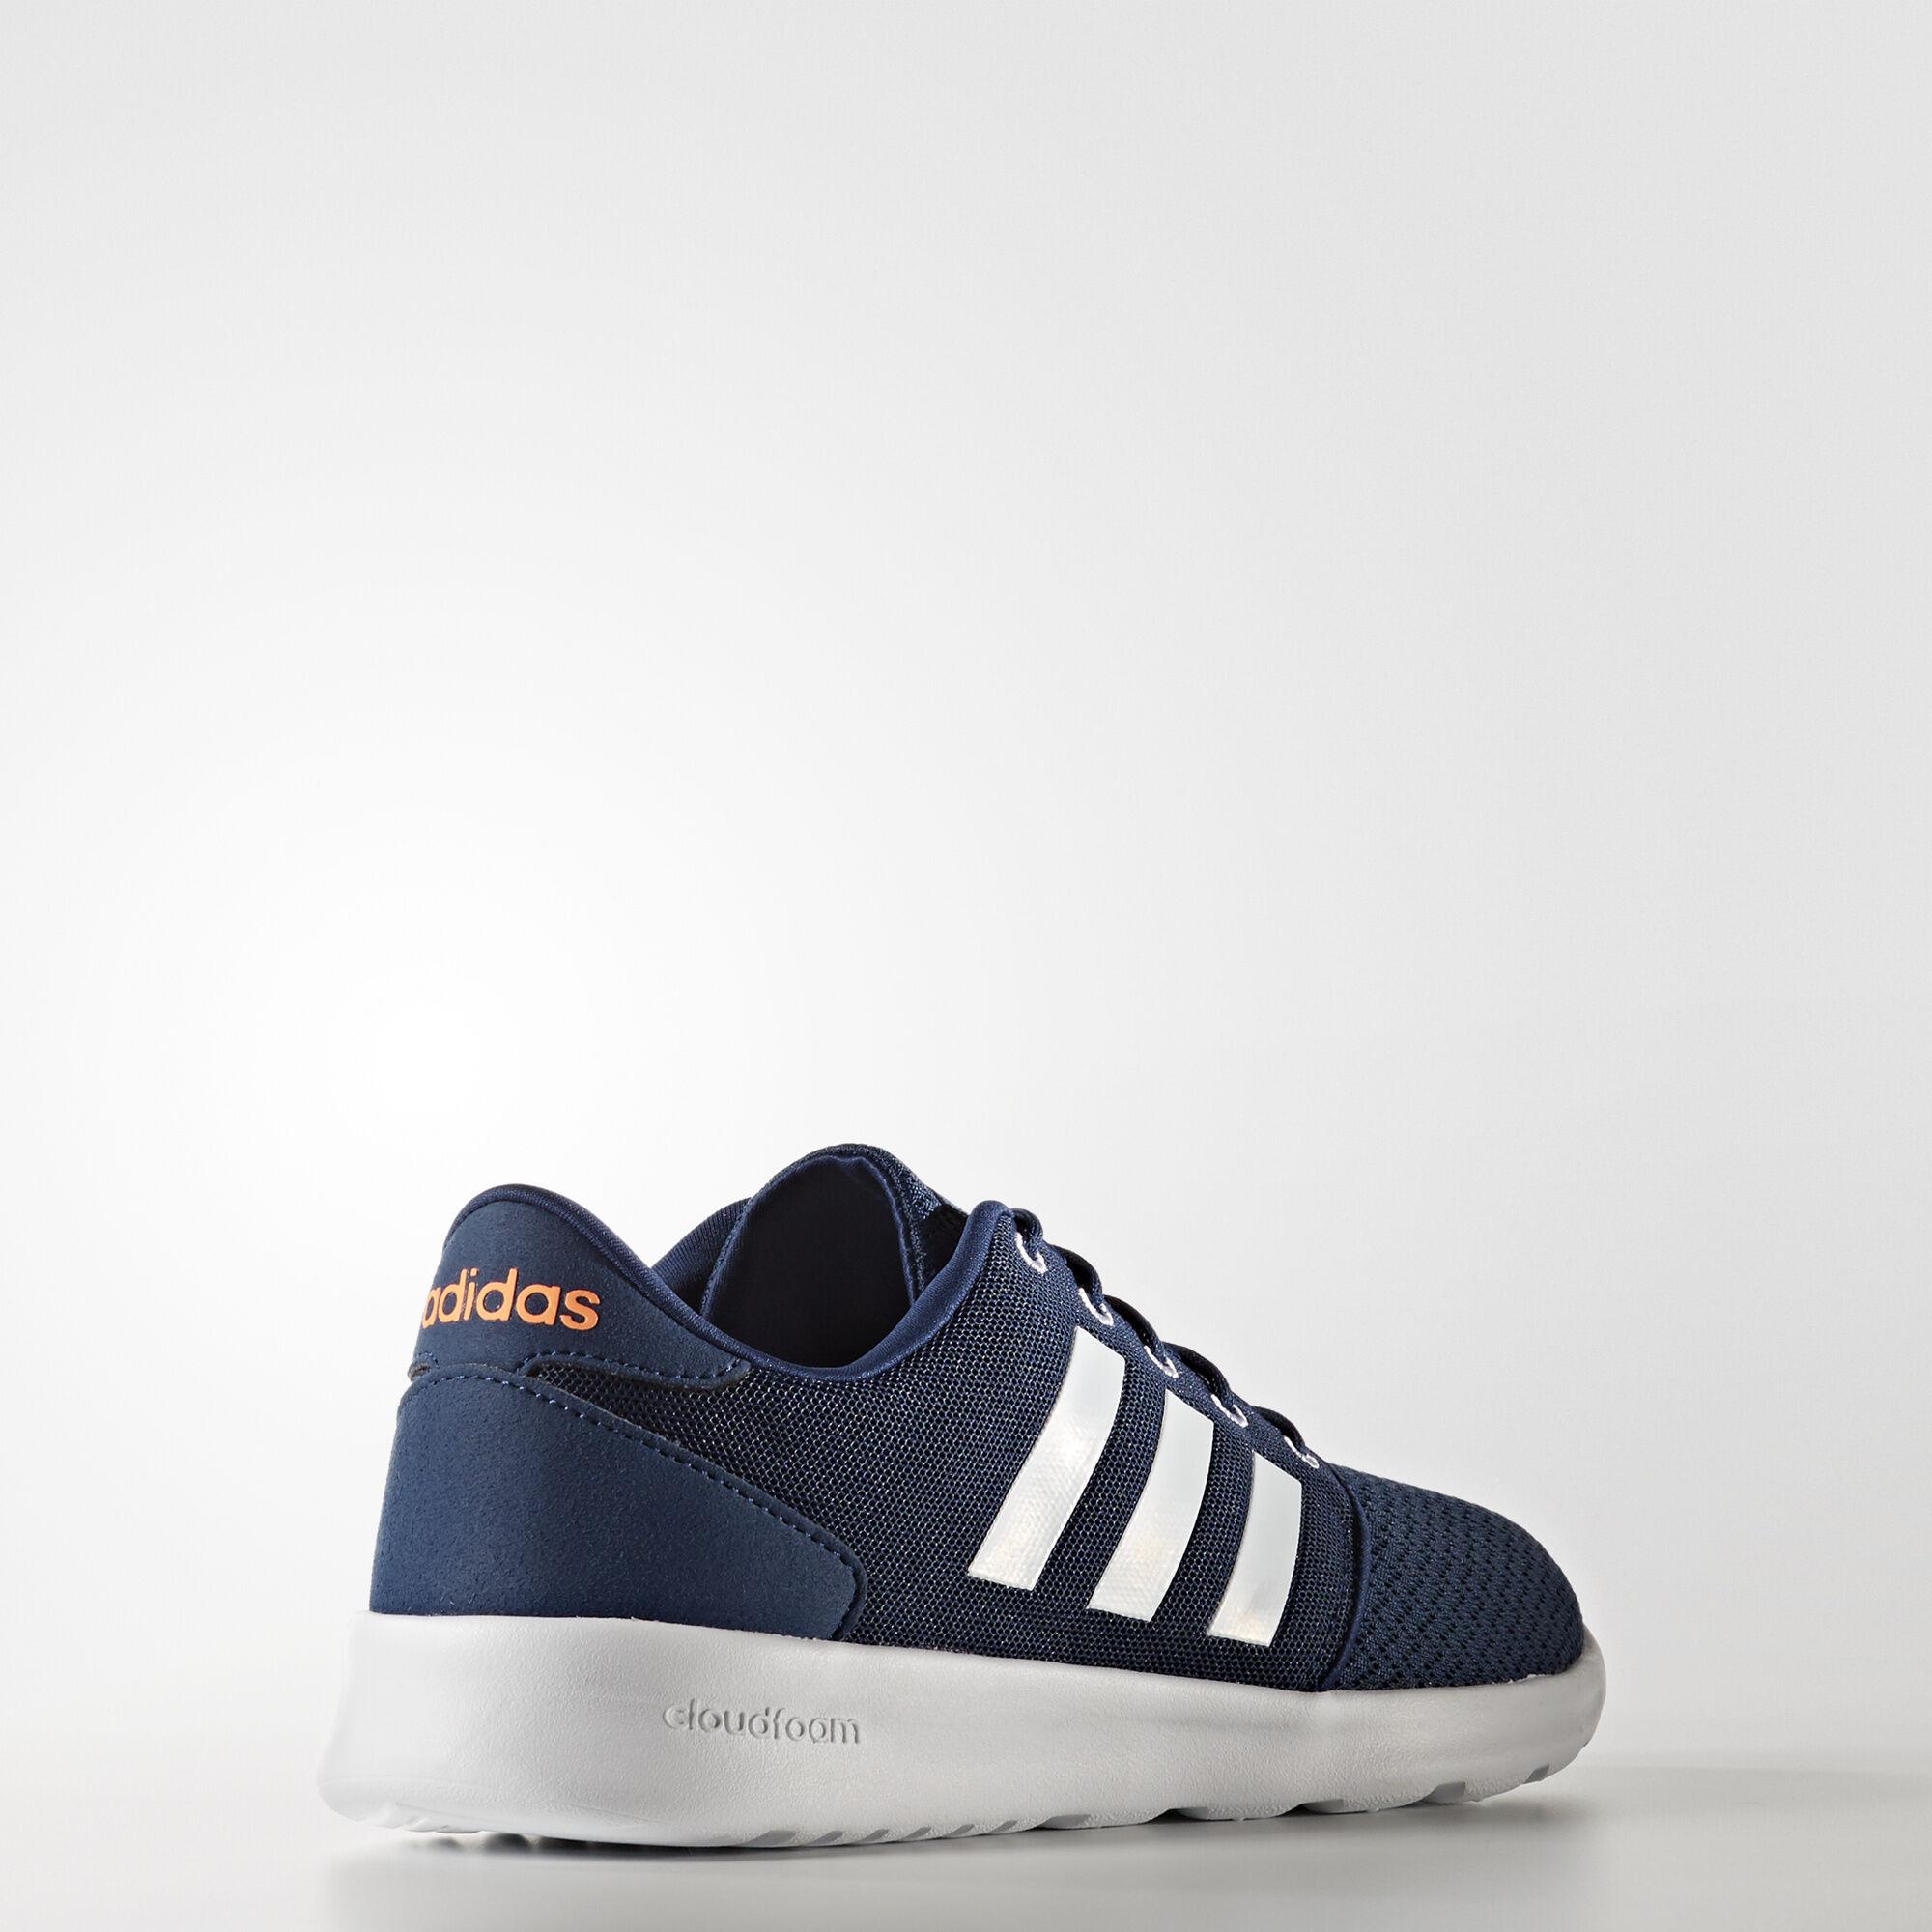 adidas Ceneo QT Women's Shoes | Casual